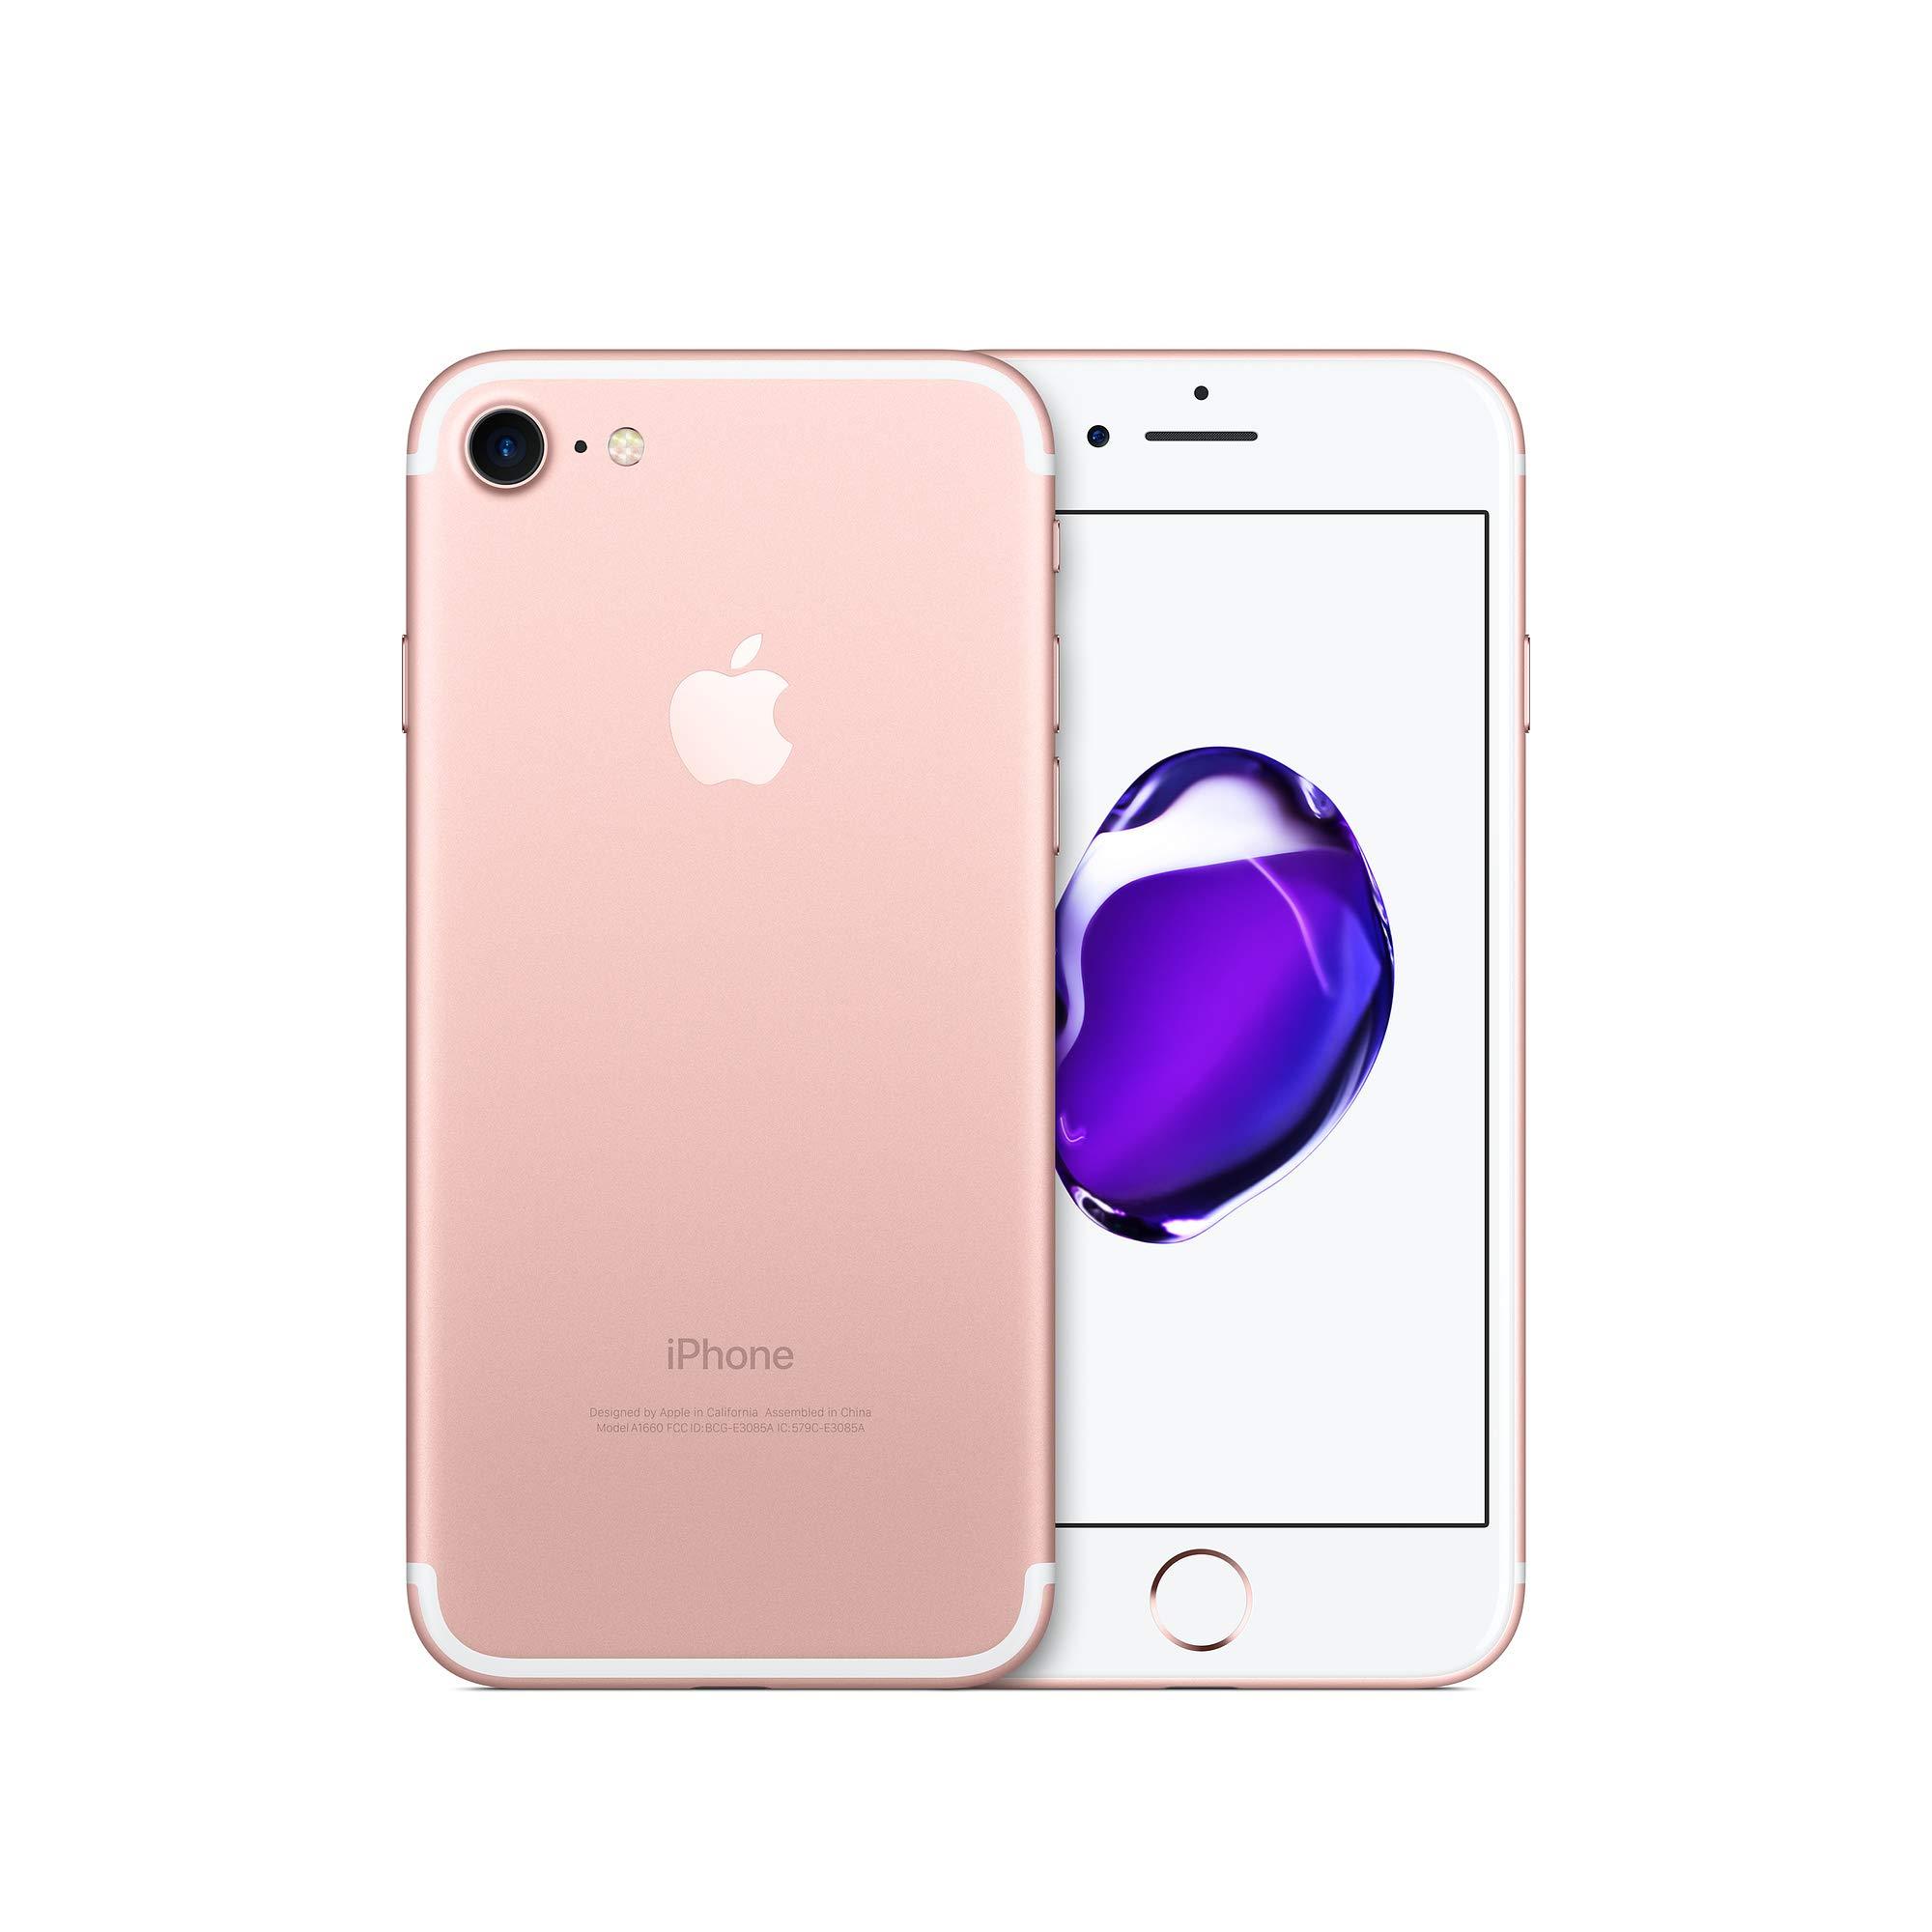 Apple iPhone 7, Verizon Unlocked, 32GB - Rose Gold - (Renewed) by Apple